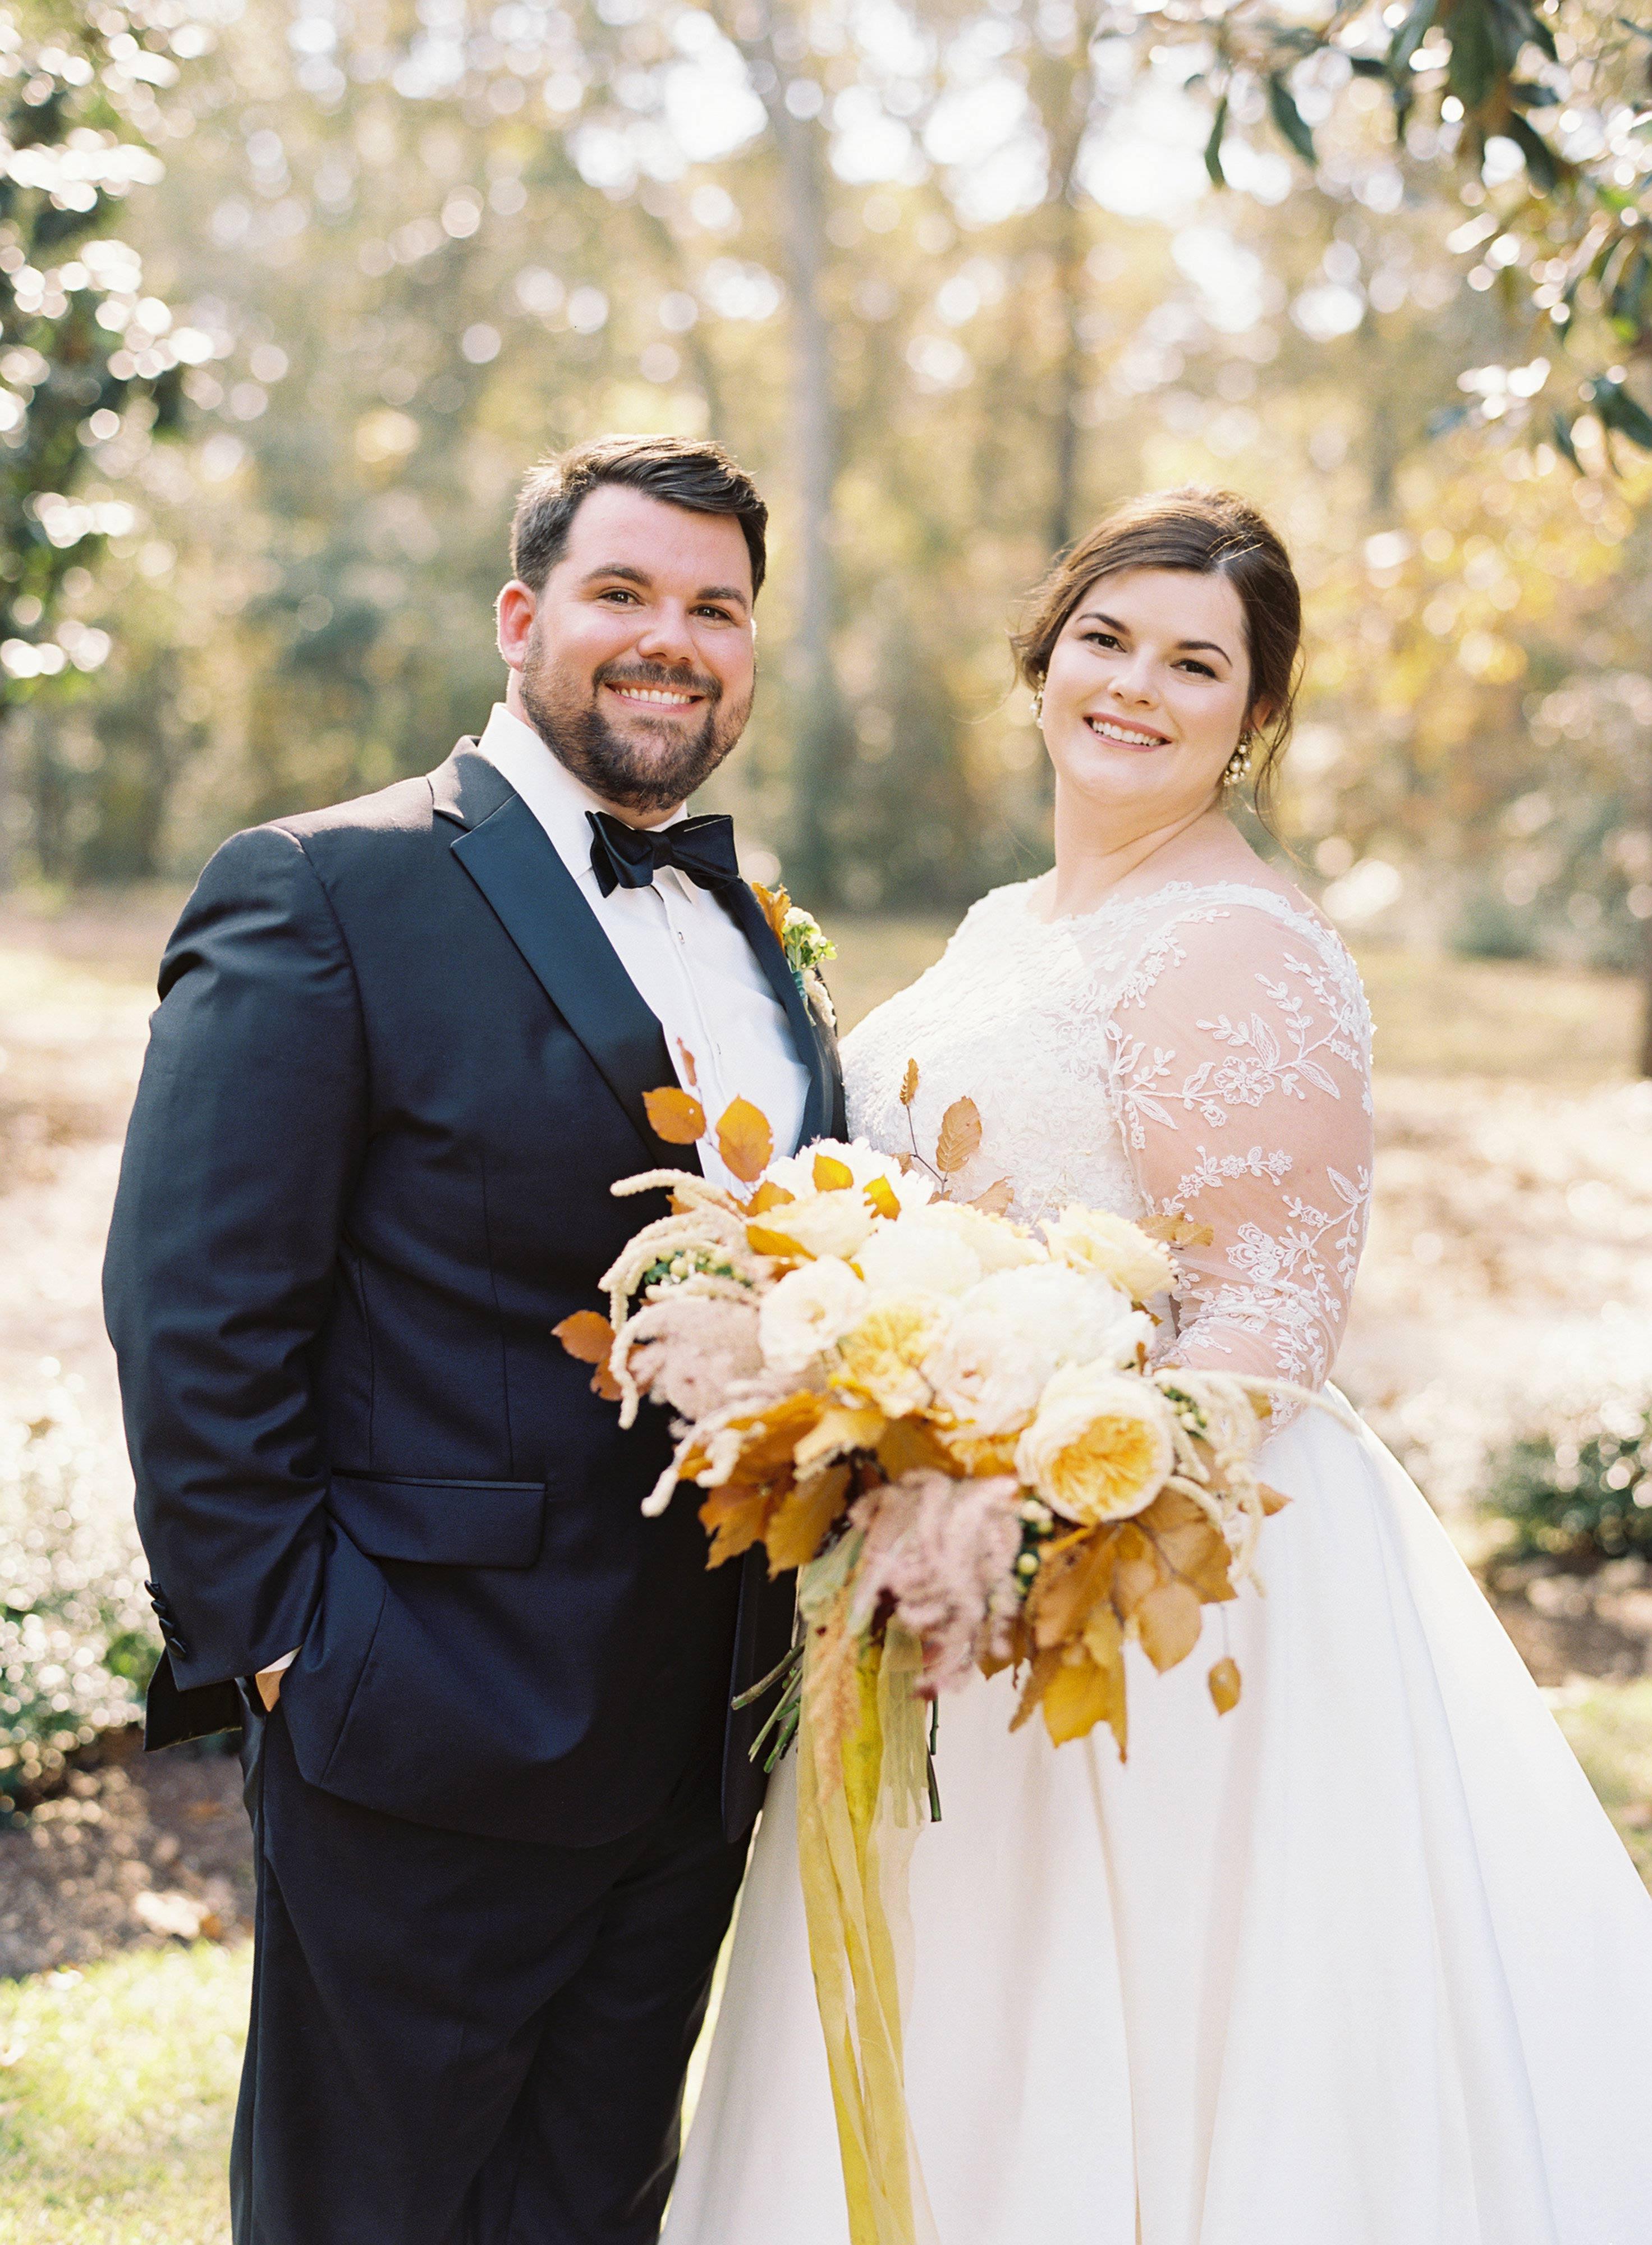 madeline brad wedding couple smile